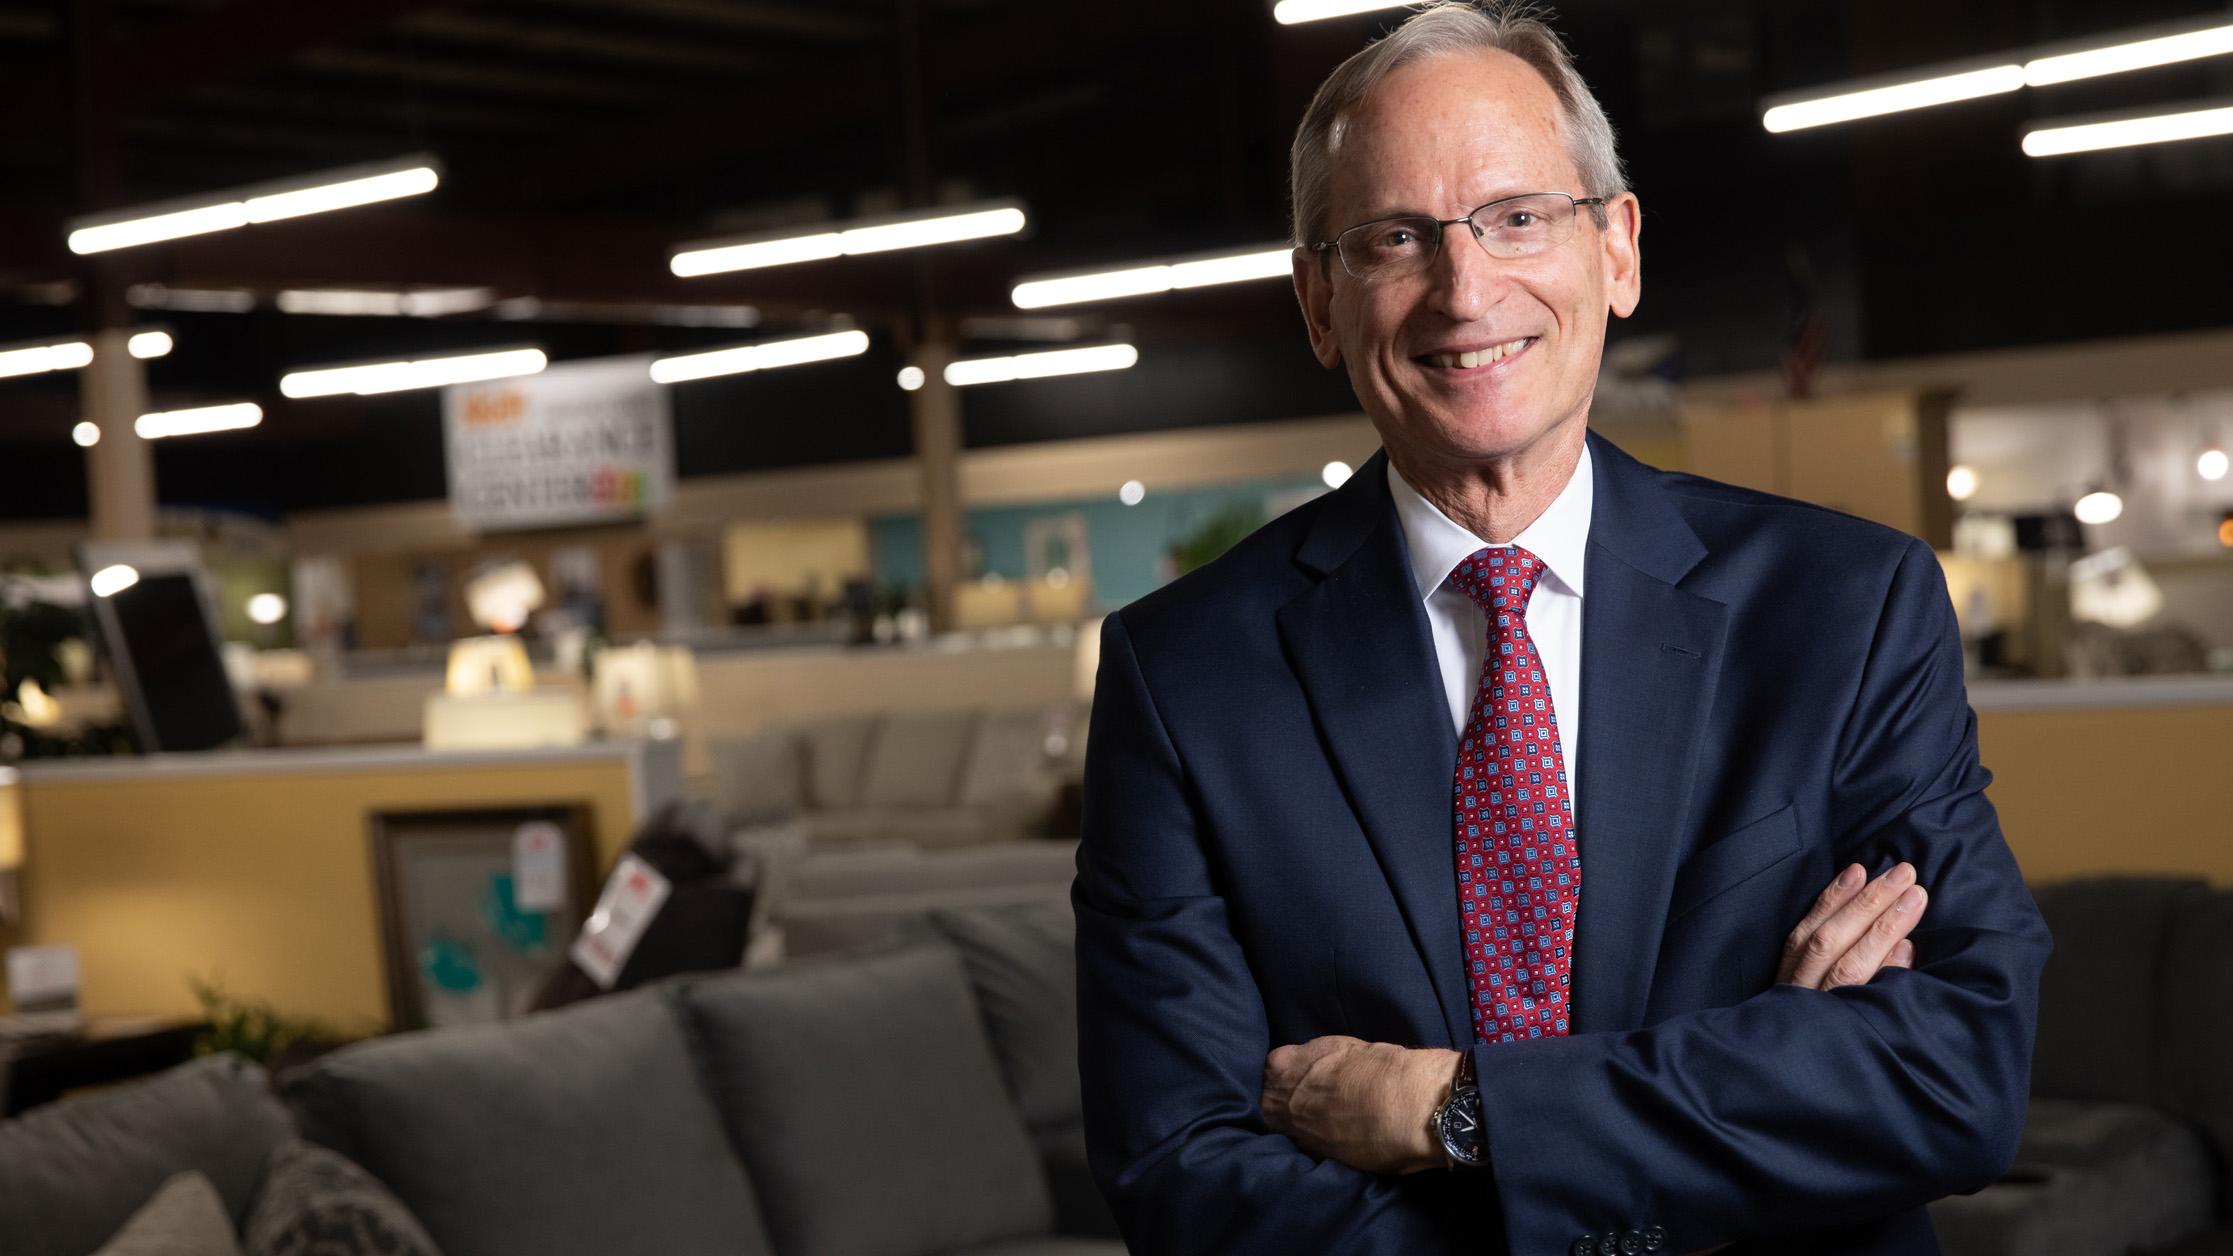 Dick Skaff, co-owner of Skaff Furniture Carpet One in Flint, MI